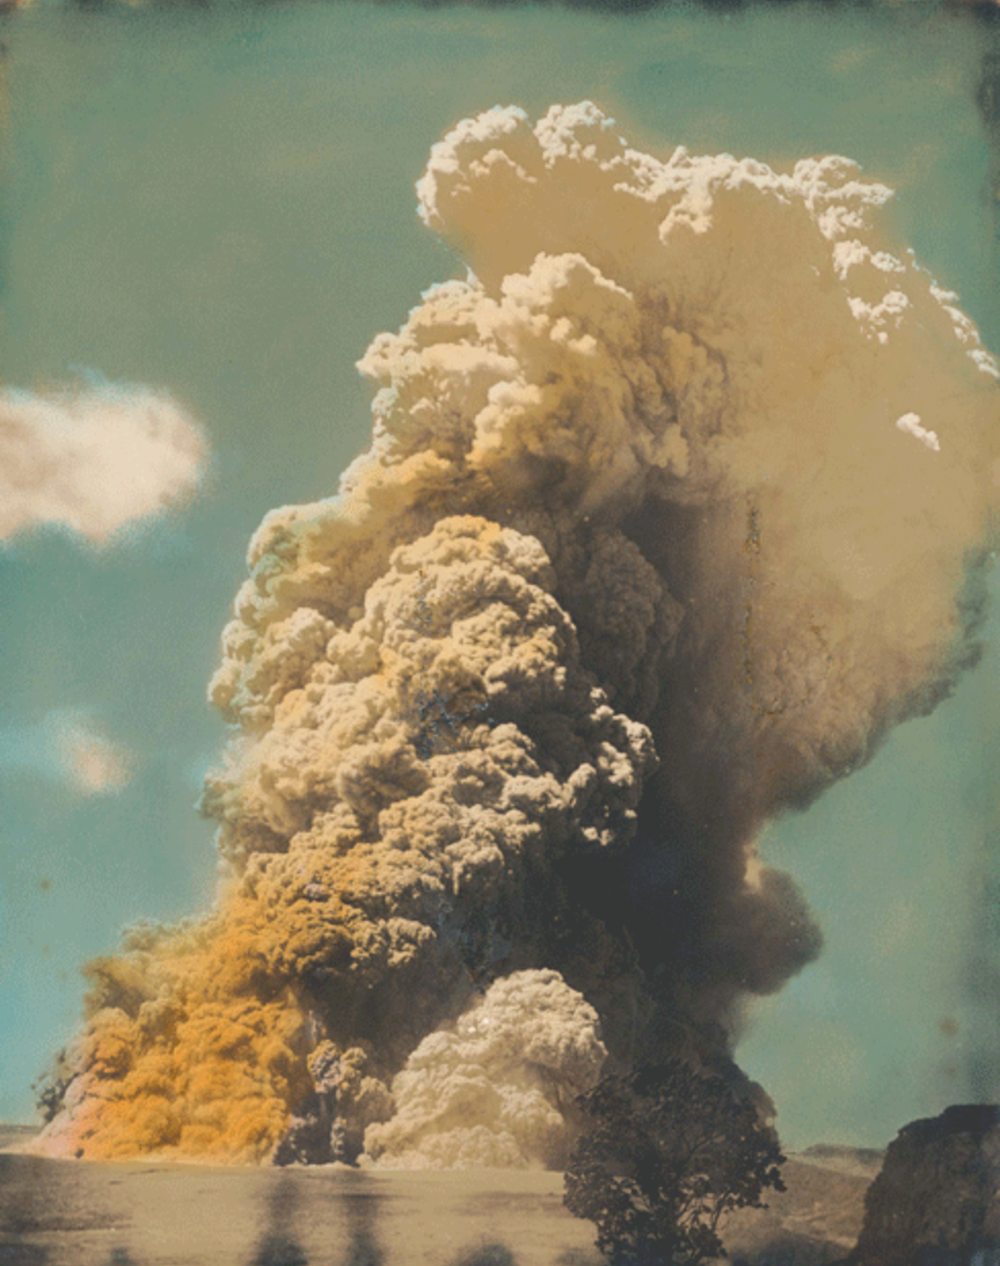 Earthquakes and Explosions: Shocking Events at Kapoho and Halema'uma'u in 1924